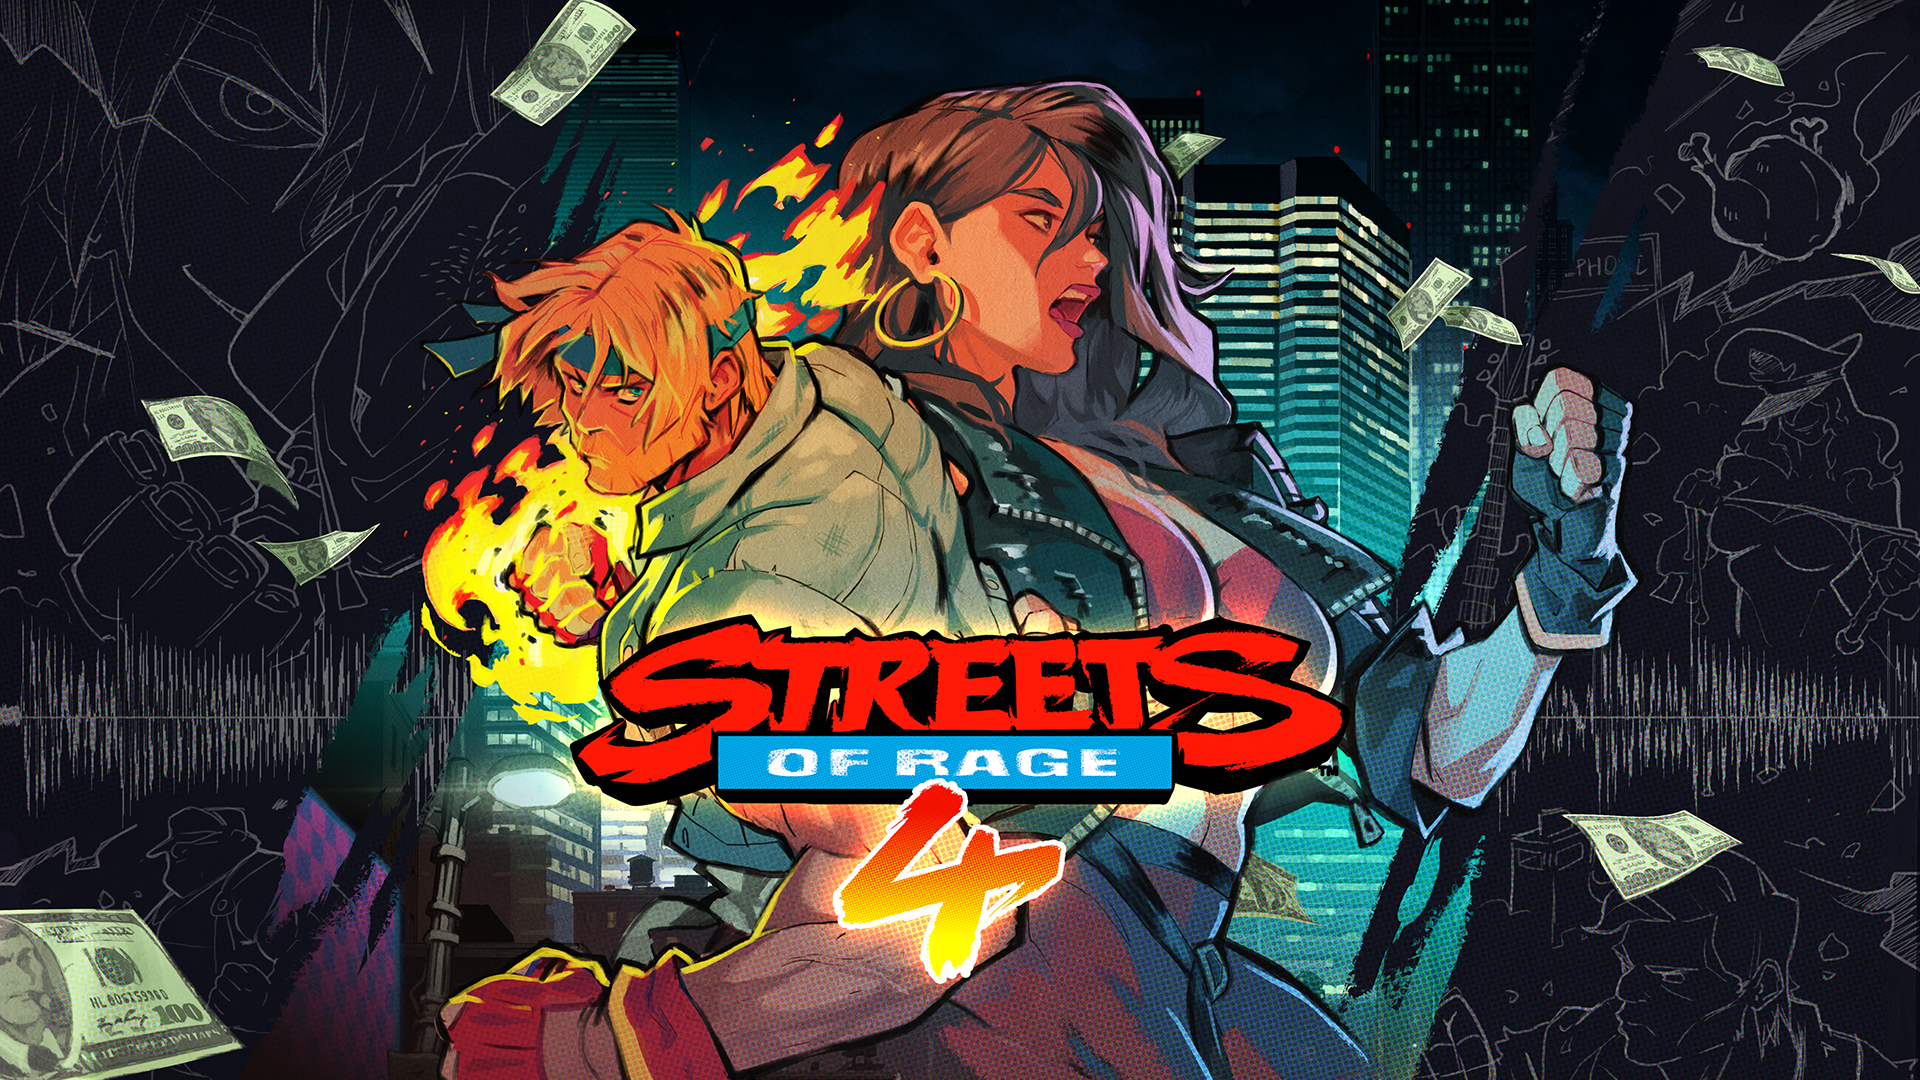 Streets of Rage 4 благополучно покоряет сердца ретрогеймеров